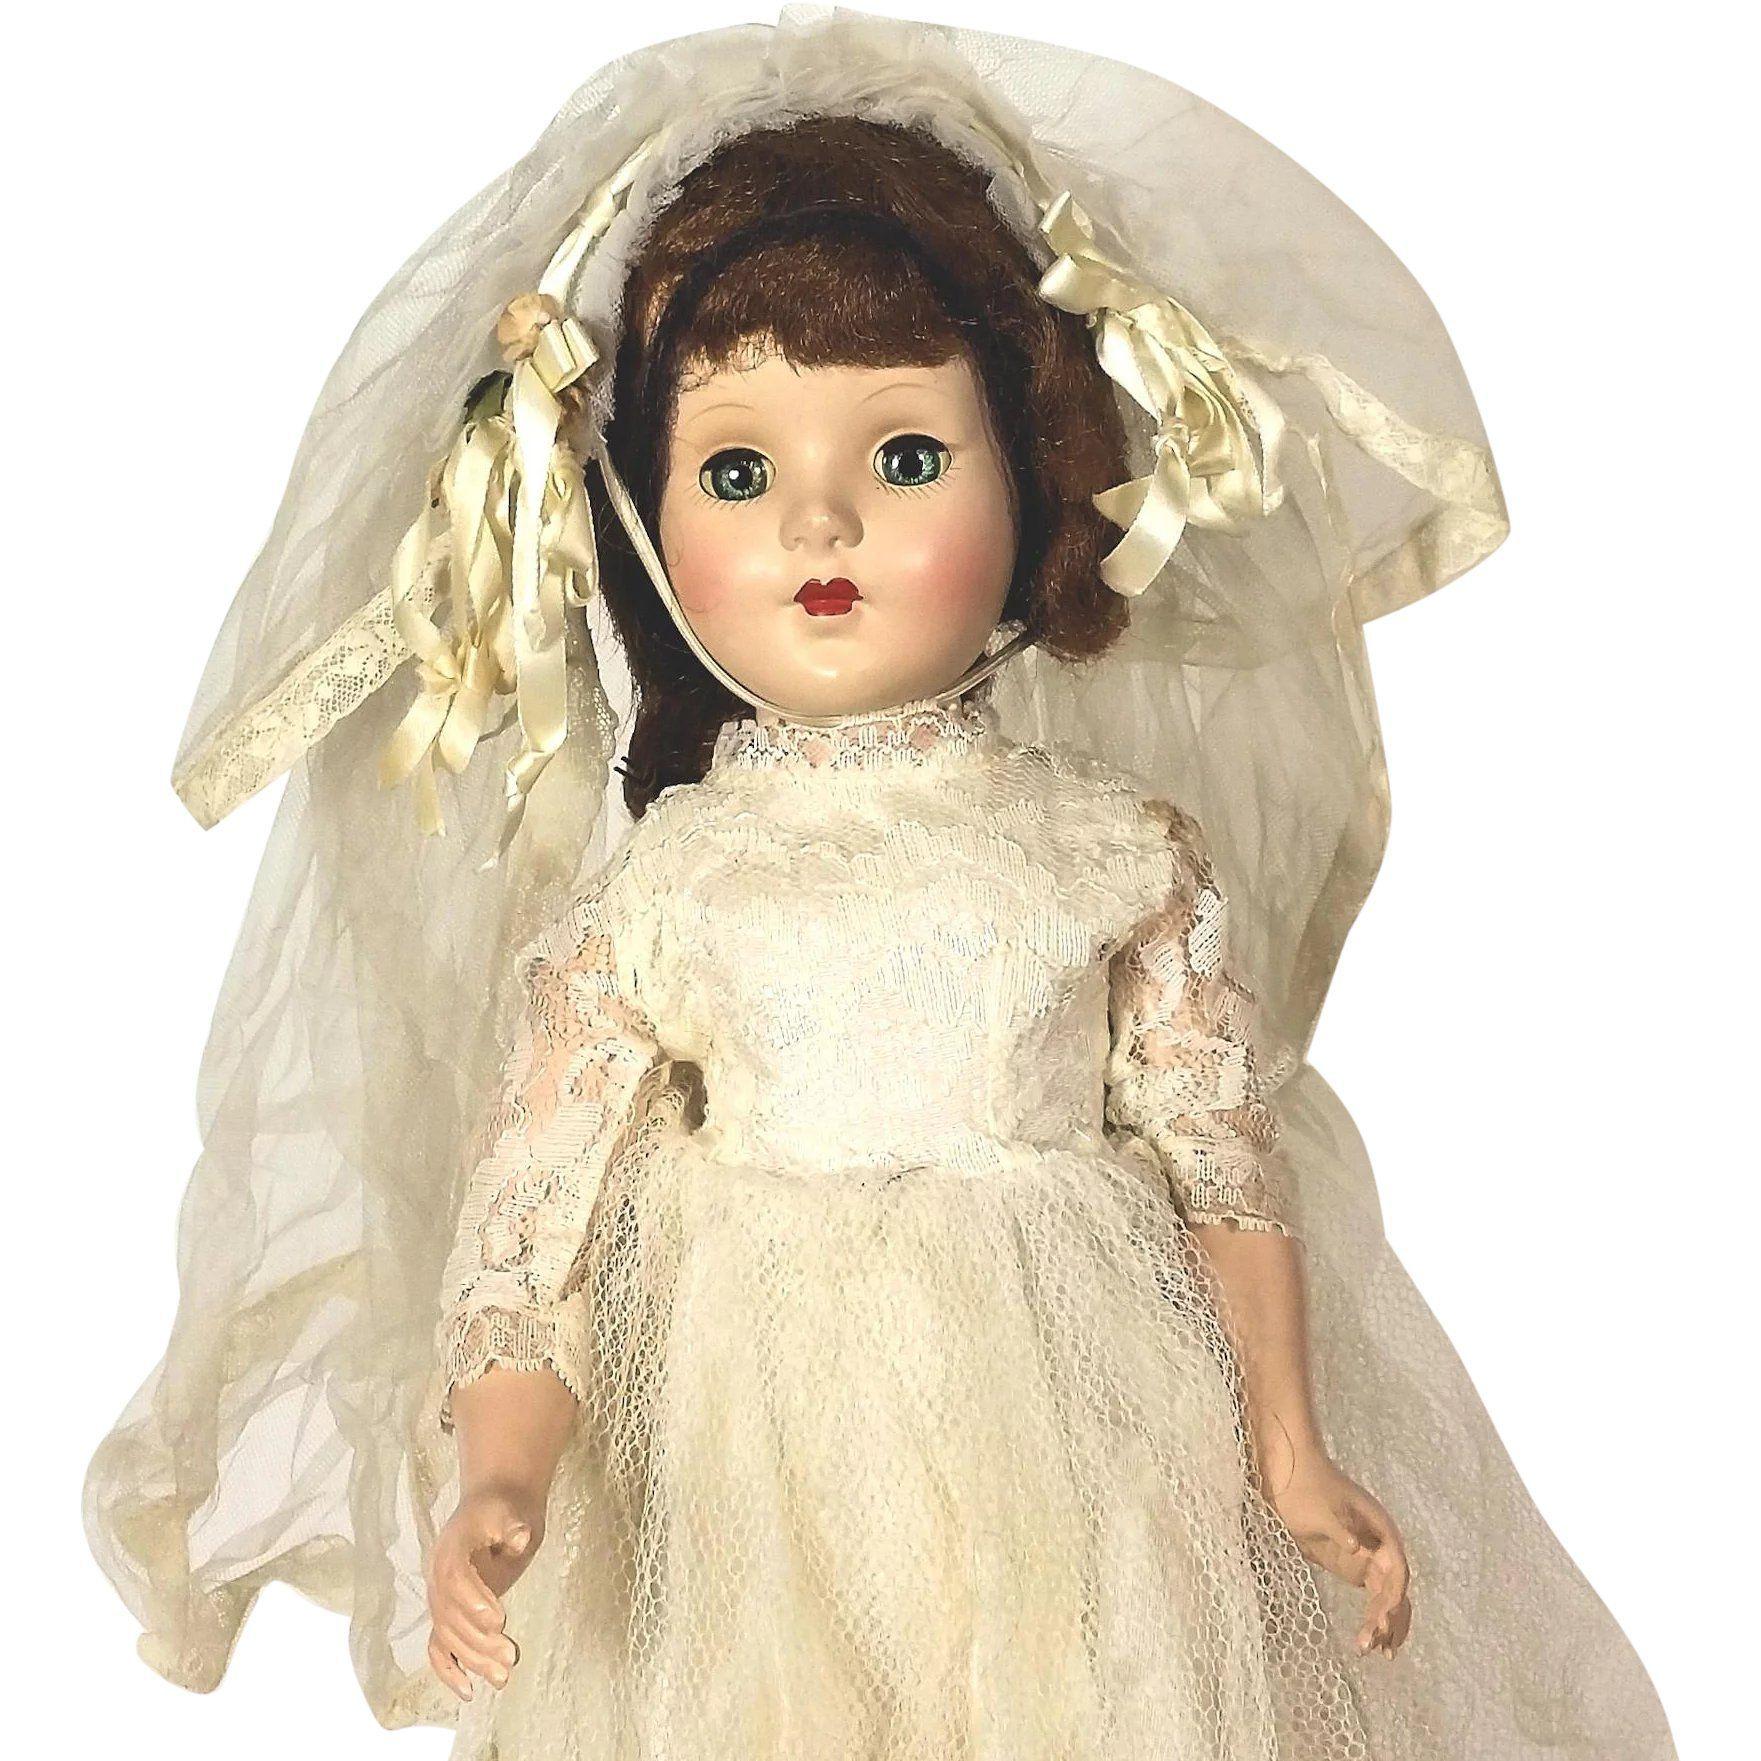 American Character Sweet Sue Walker Bride Doll #bridedolls American Character Sweet Sue Walker Bride Doll -- found at www.rubylane.com #thedollworldshome #vintagebeginshere #bride #doll #giftsforher #valentinesday #bridedolls